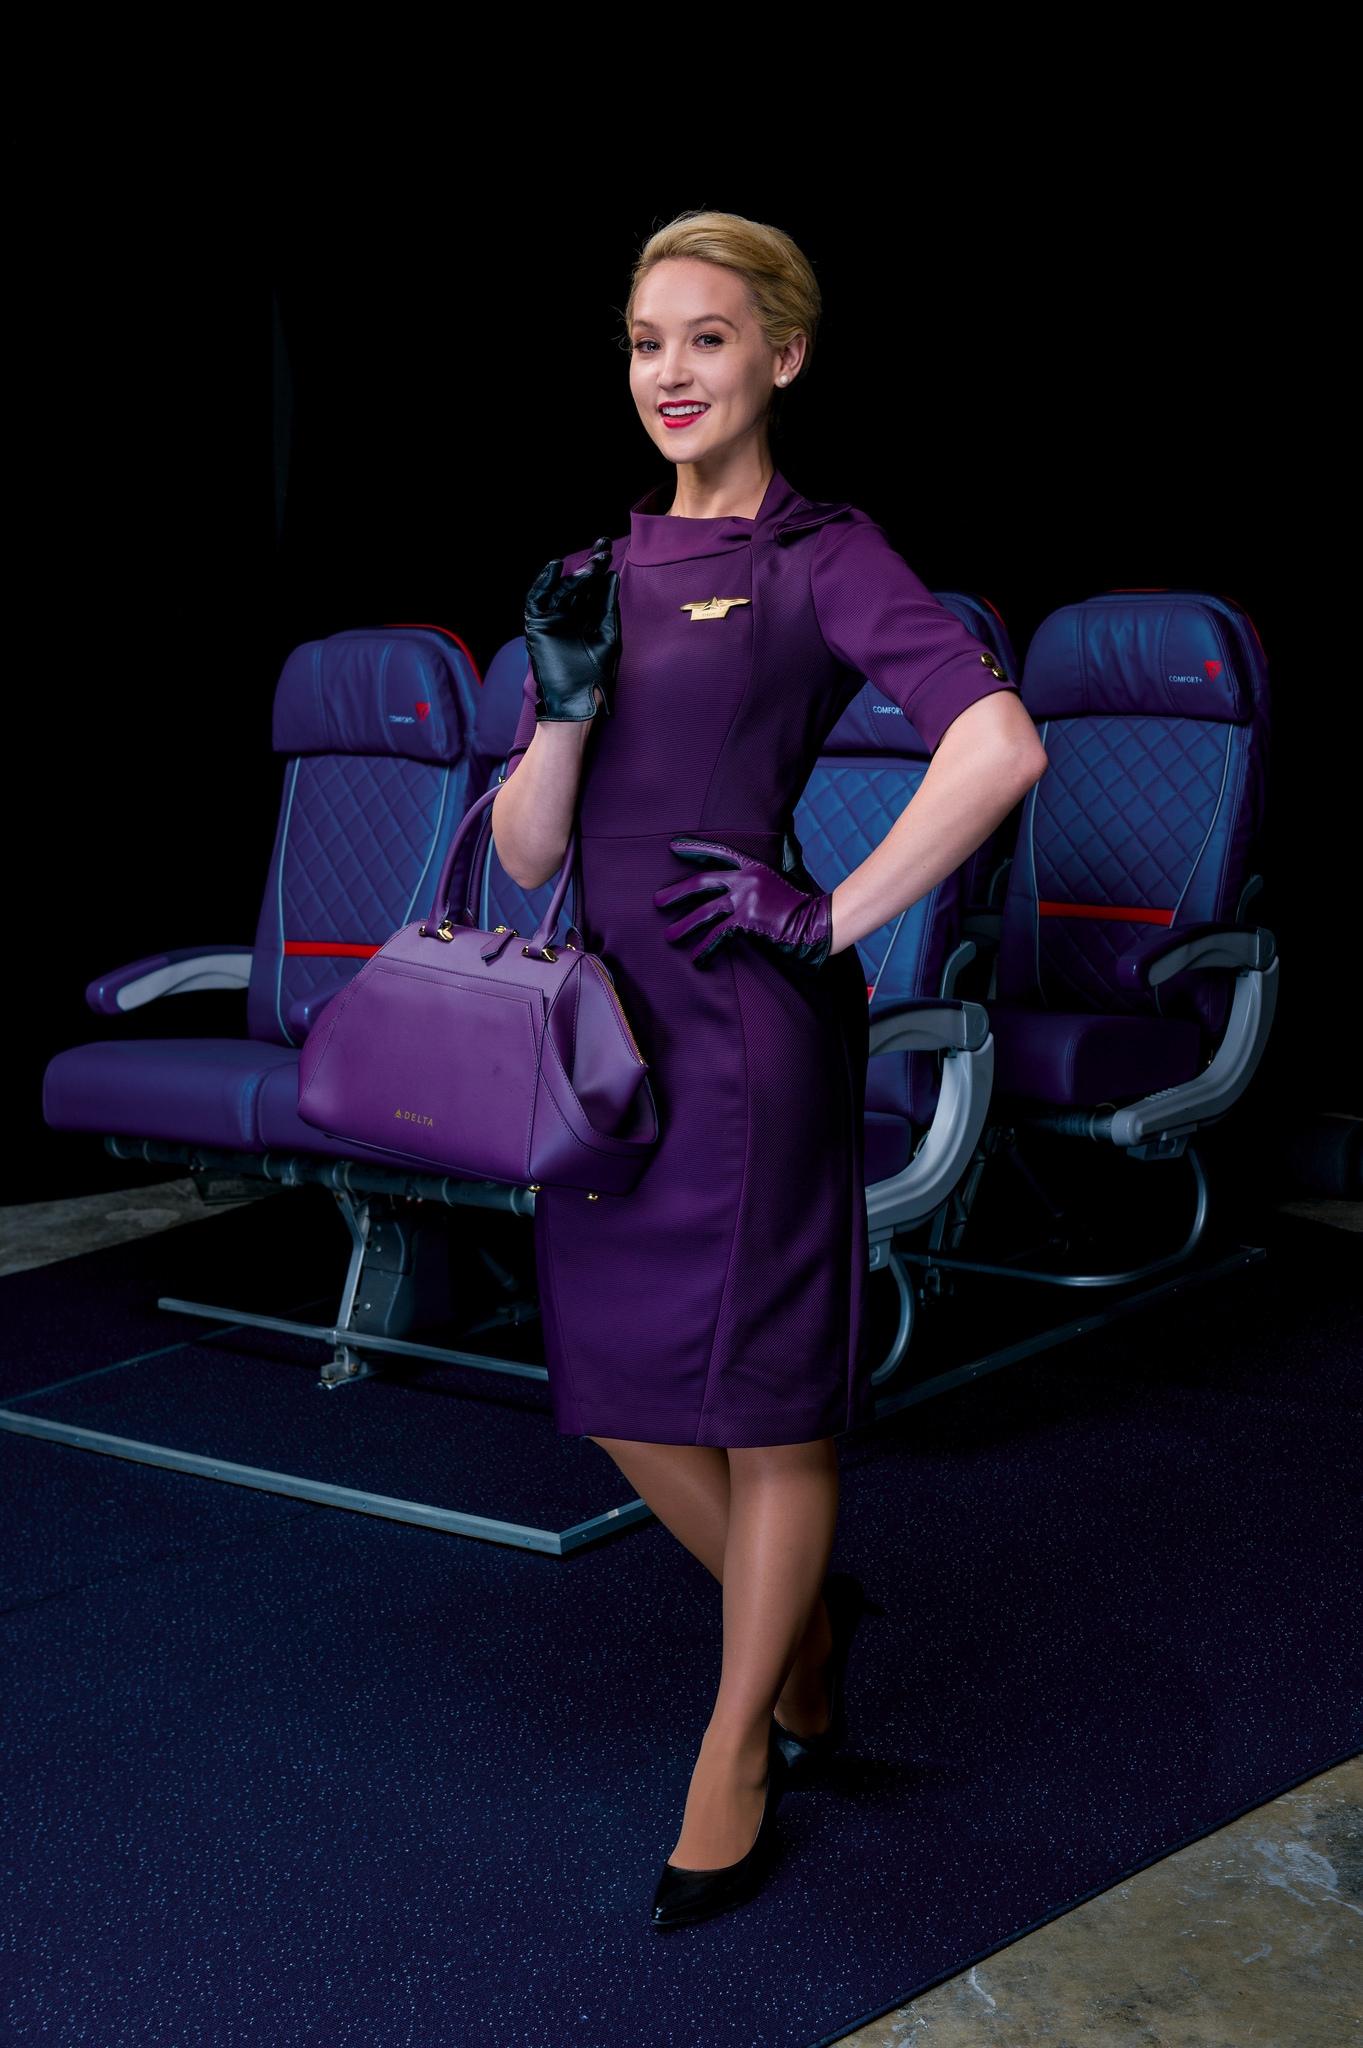 Female in-flight uniform